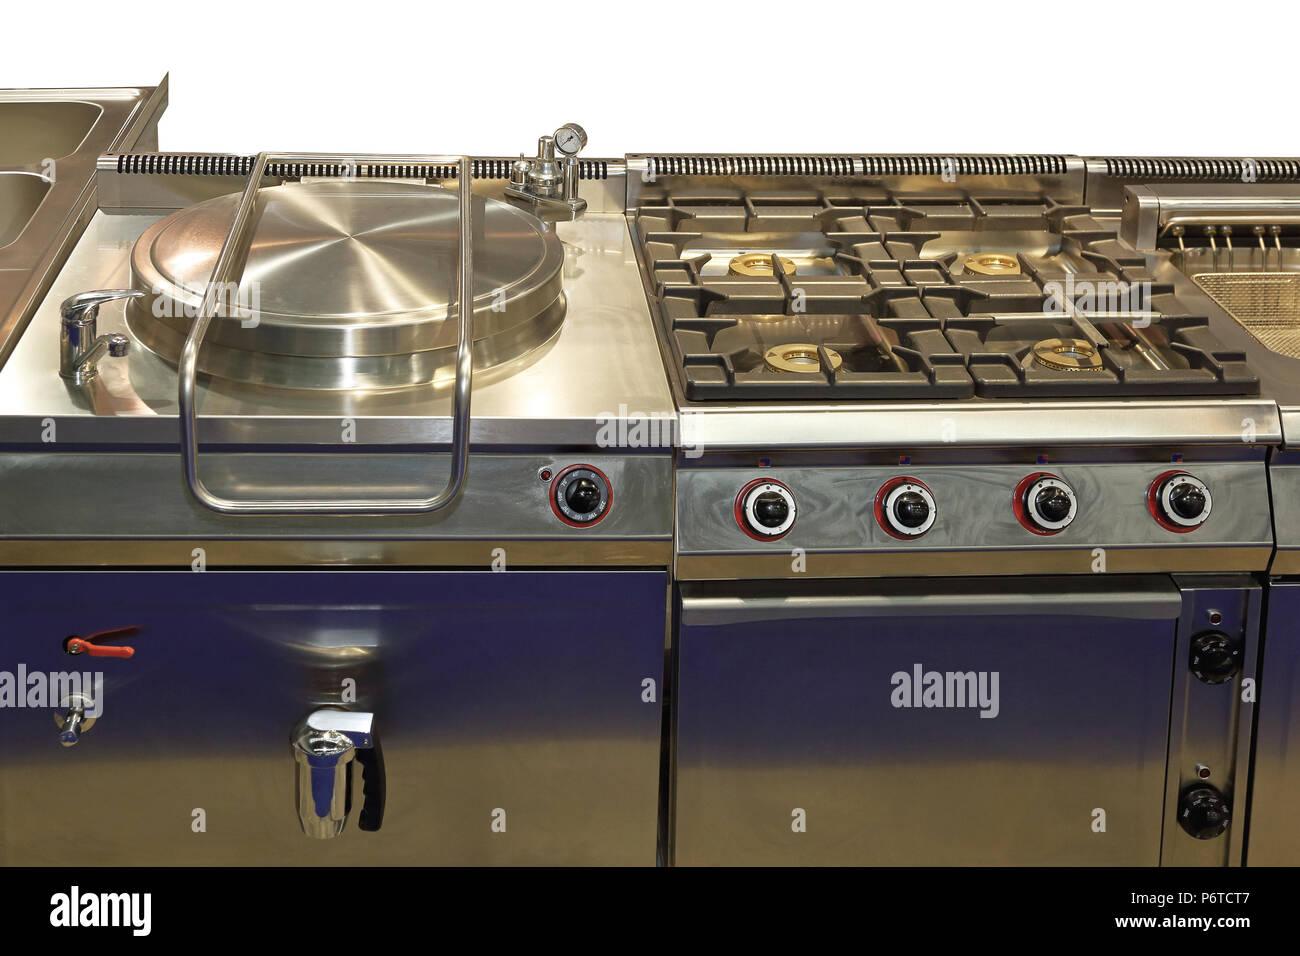 Range Cooker Kitchen Appliances Stockfotos & Range Cooker Kitchen ...